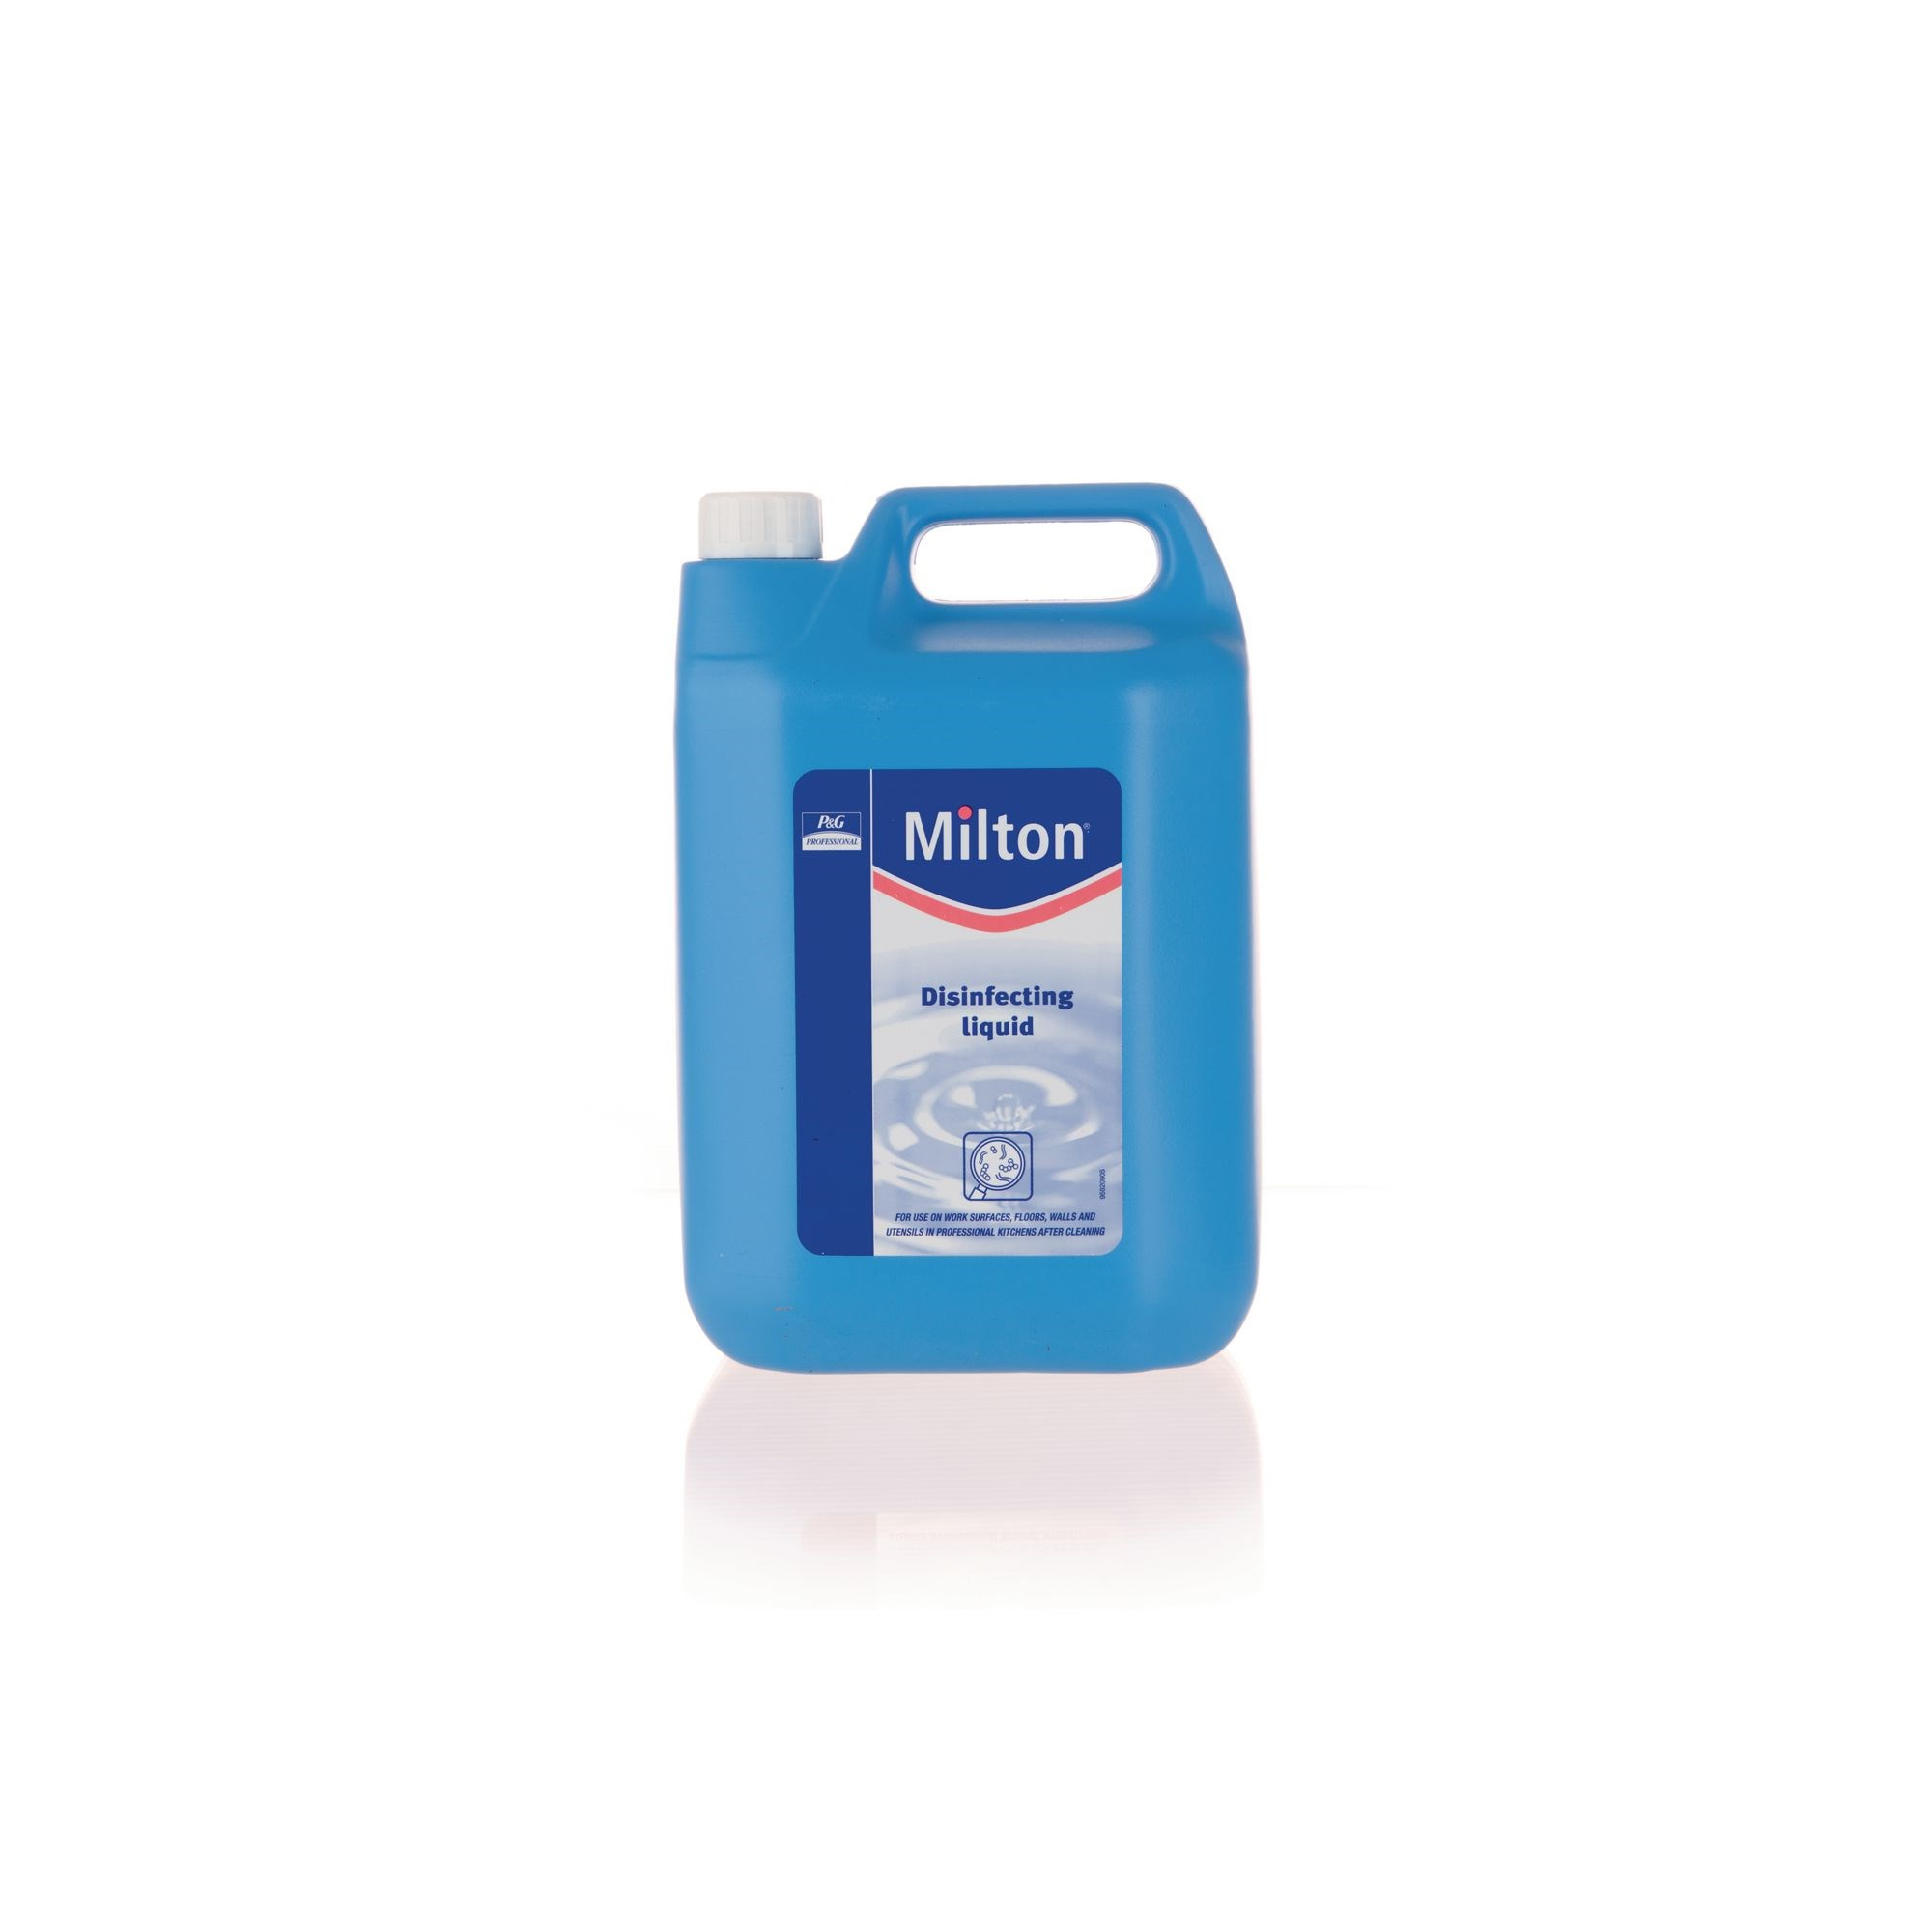 Milton Disinfecting Fluid 5L